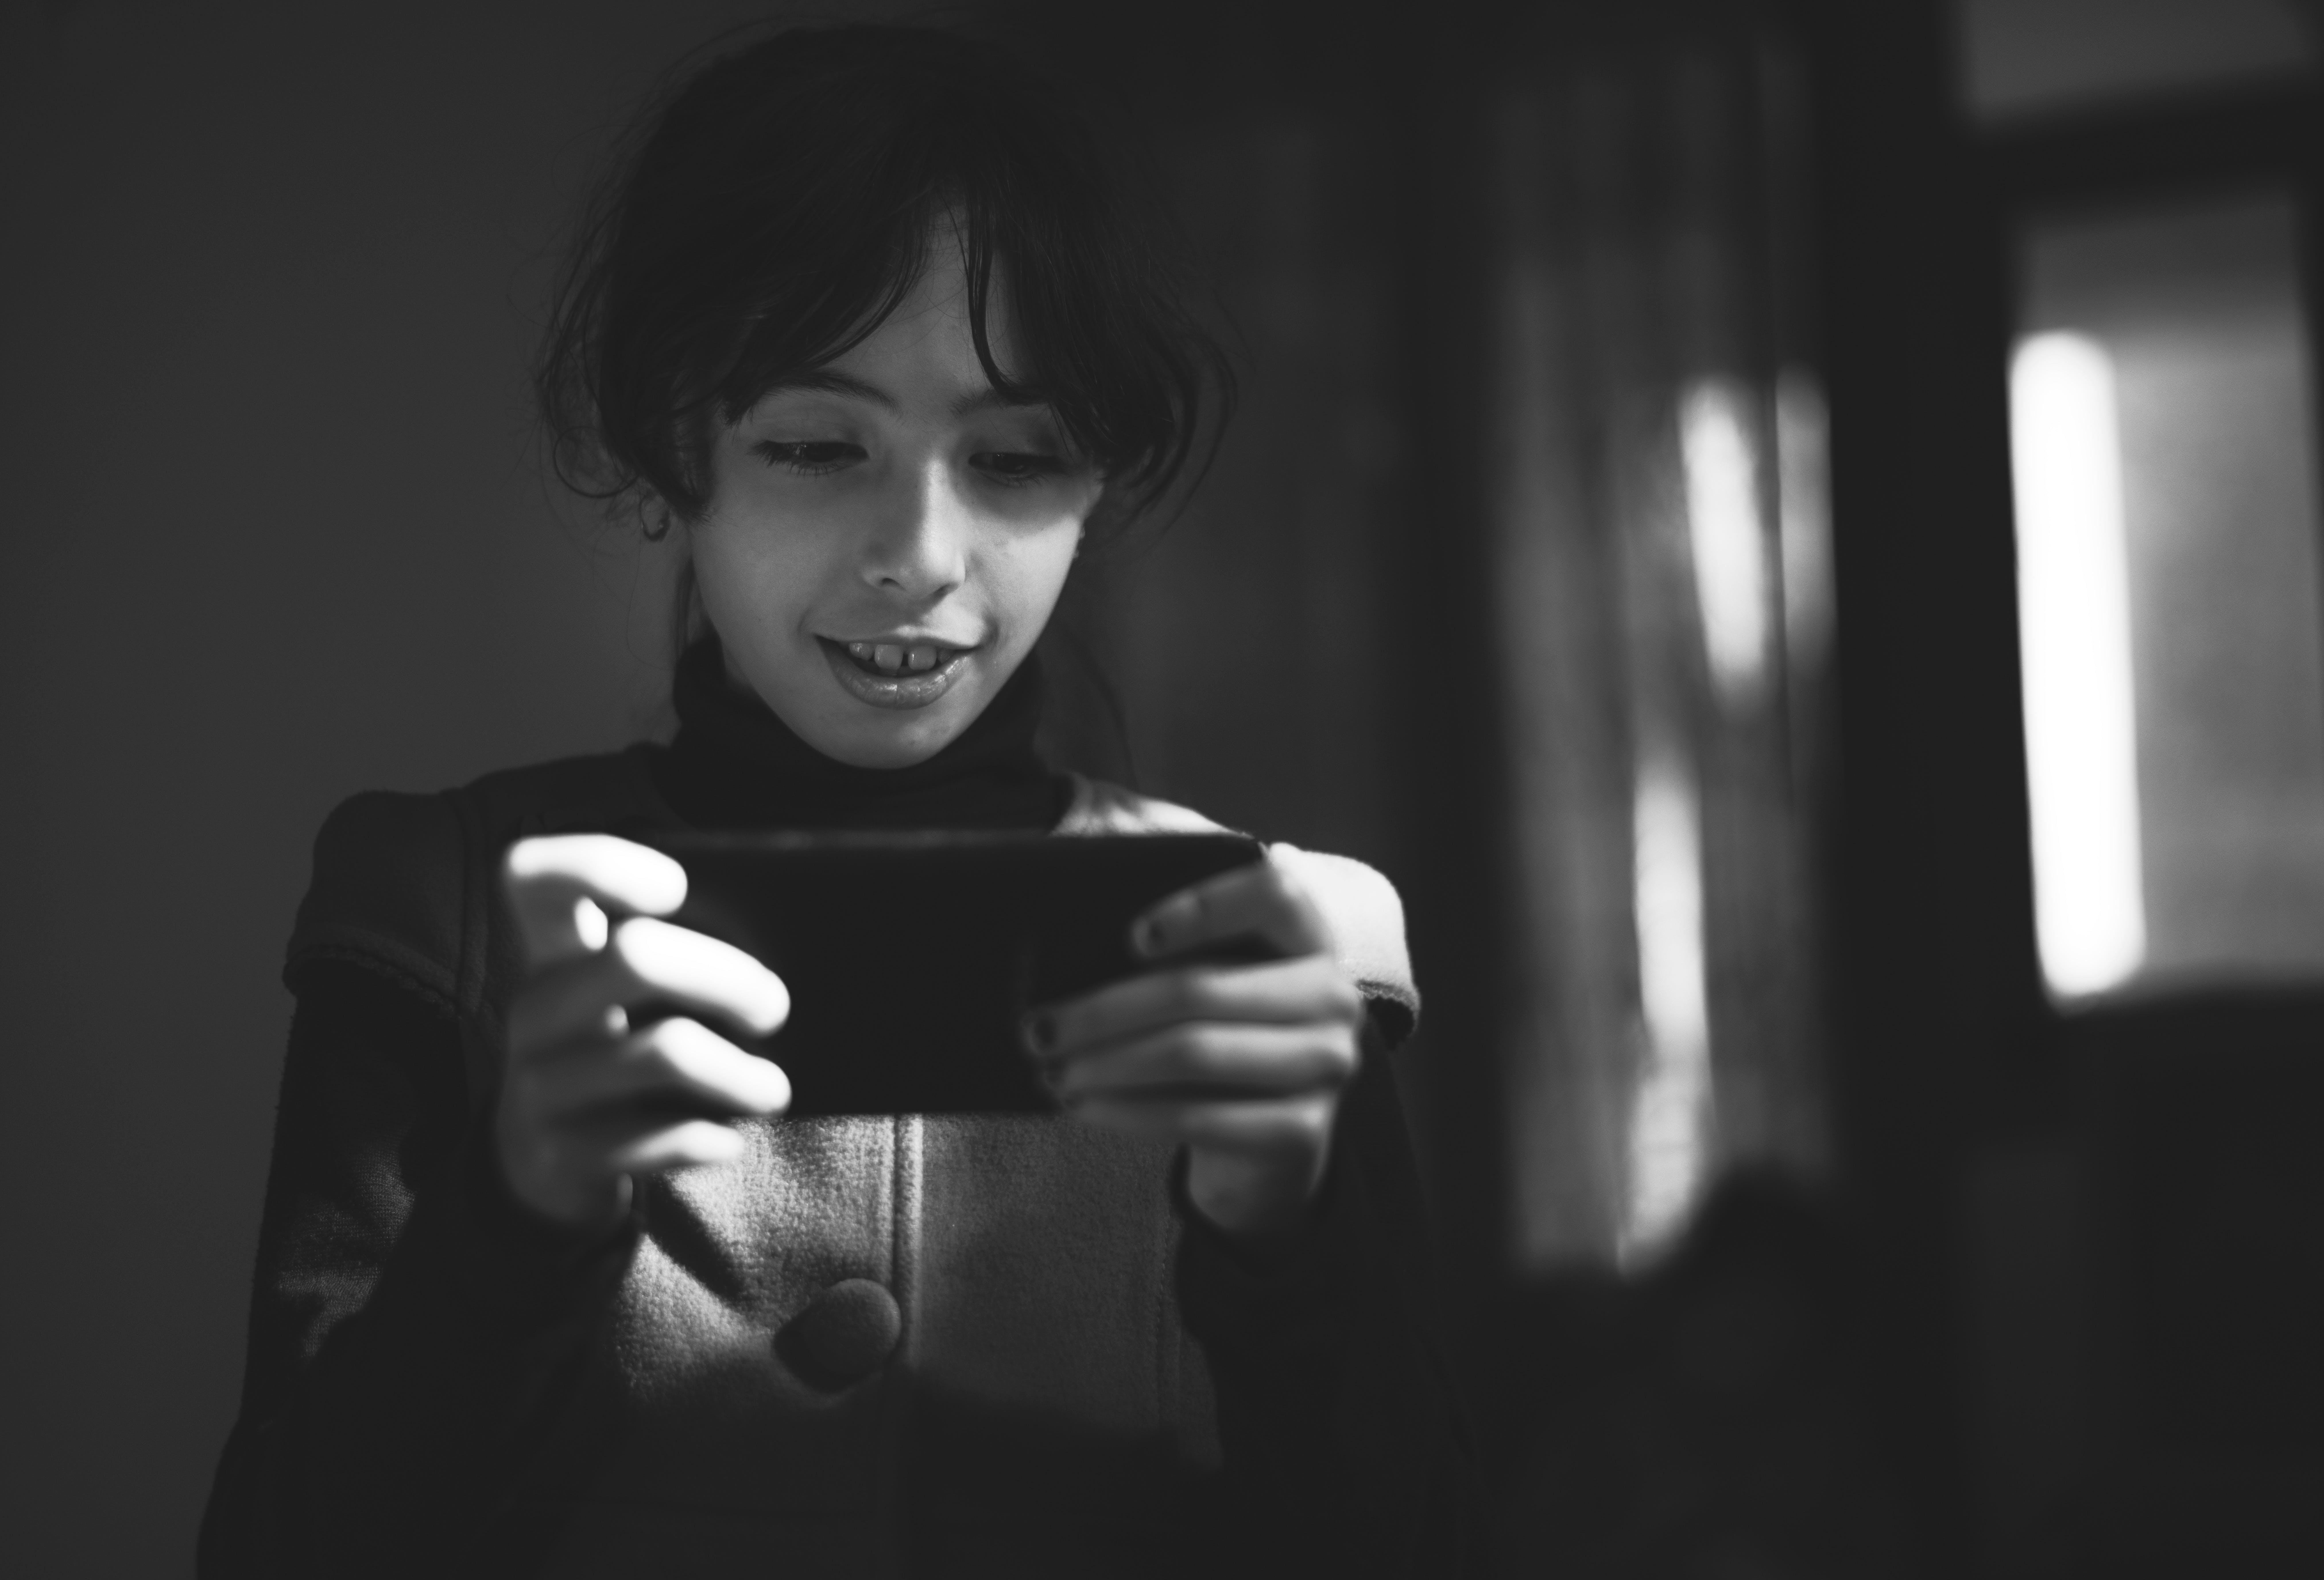 Grayscale Photography of Girl Using Smartphone